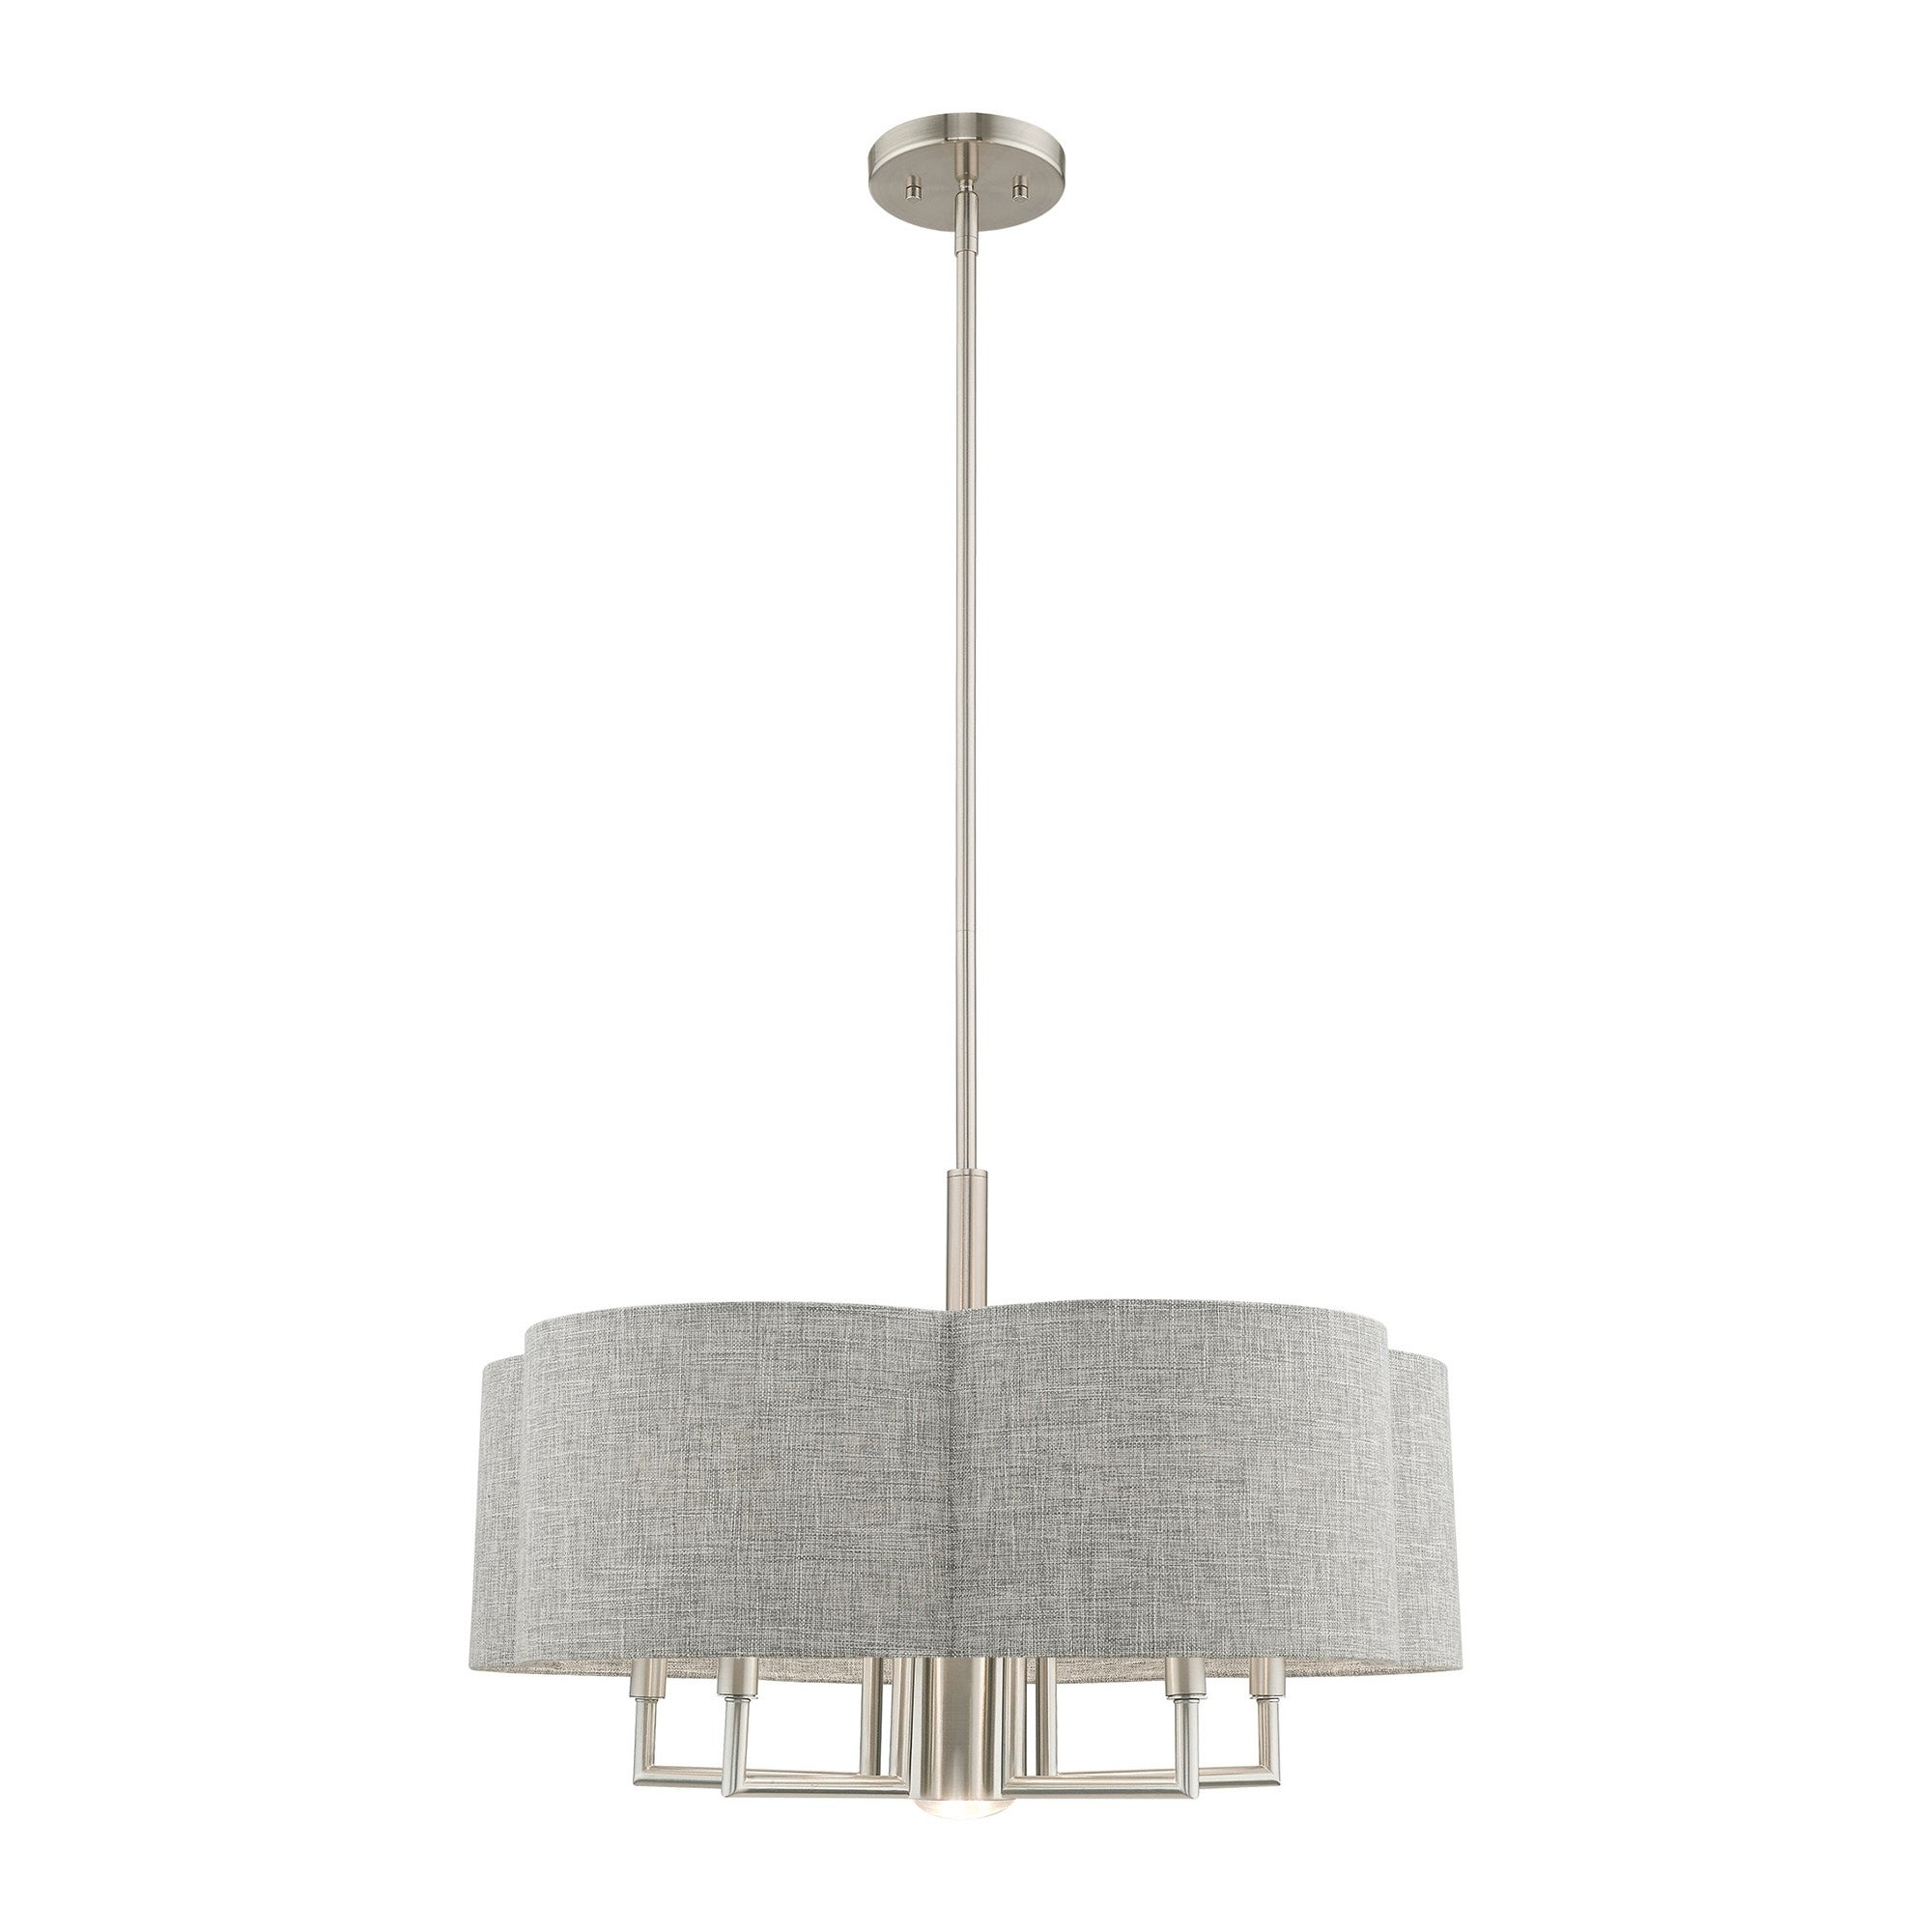 Livex Lighting Kalmar 6 Light Brushed Nickel Pendant Chandelier 24 Dia X 17 5 53 Adj H